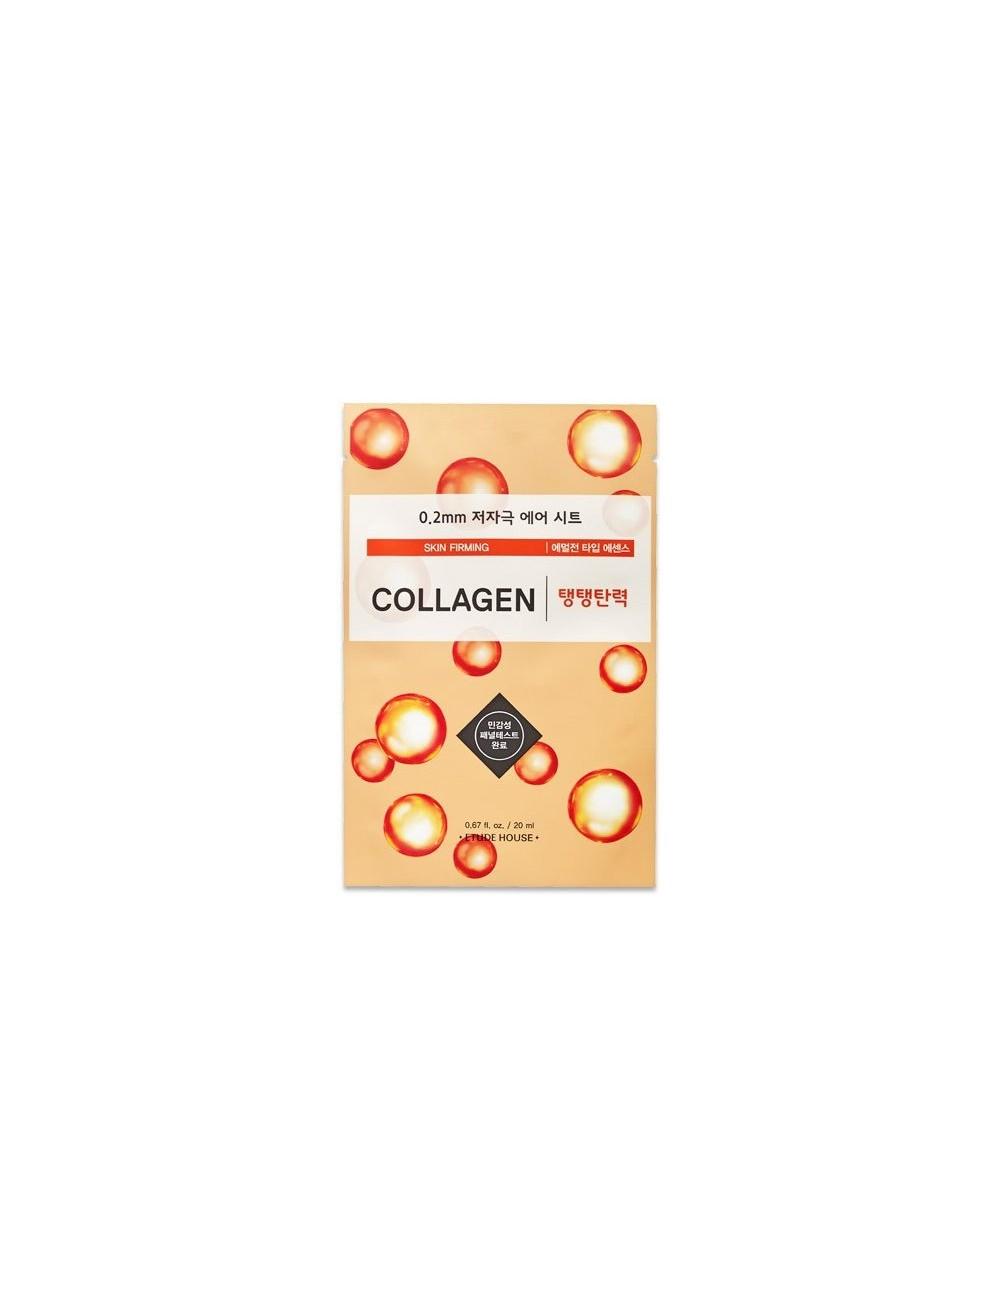 Mascarilla Refirmante Etude House 0.2 Therapy Air Mask Collagen